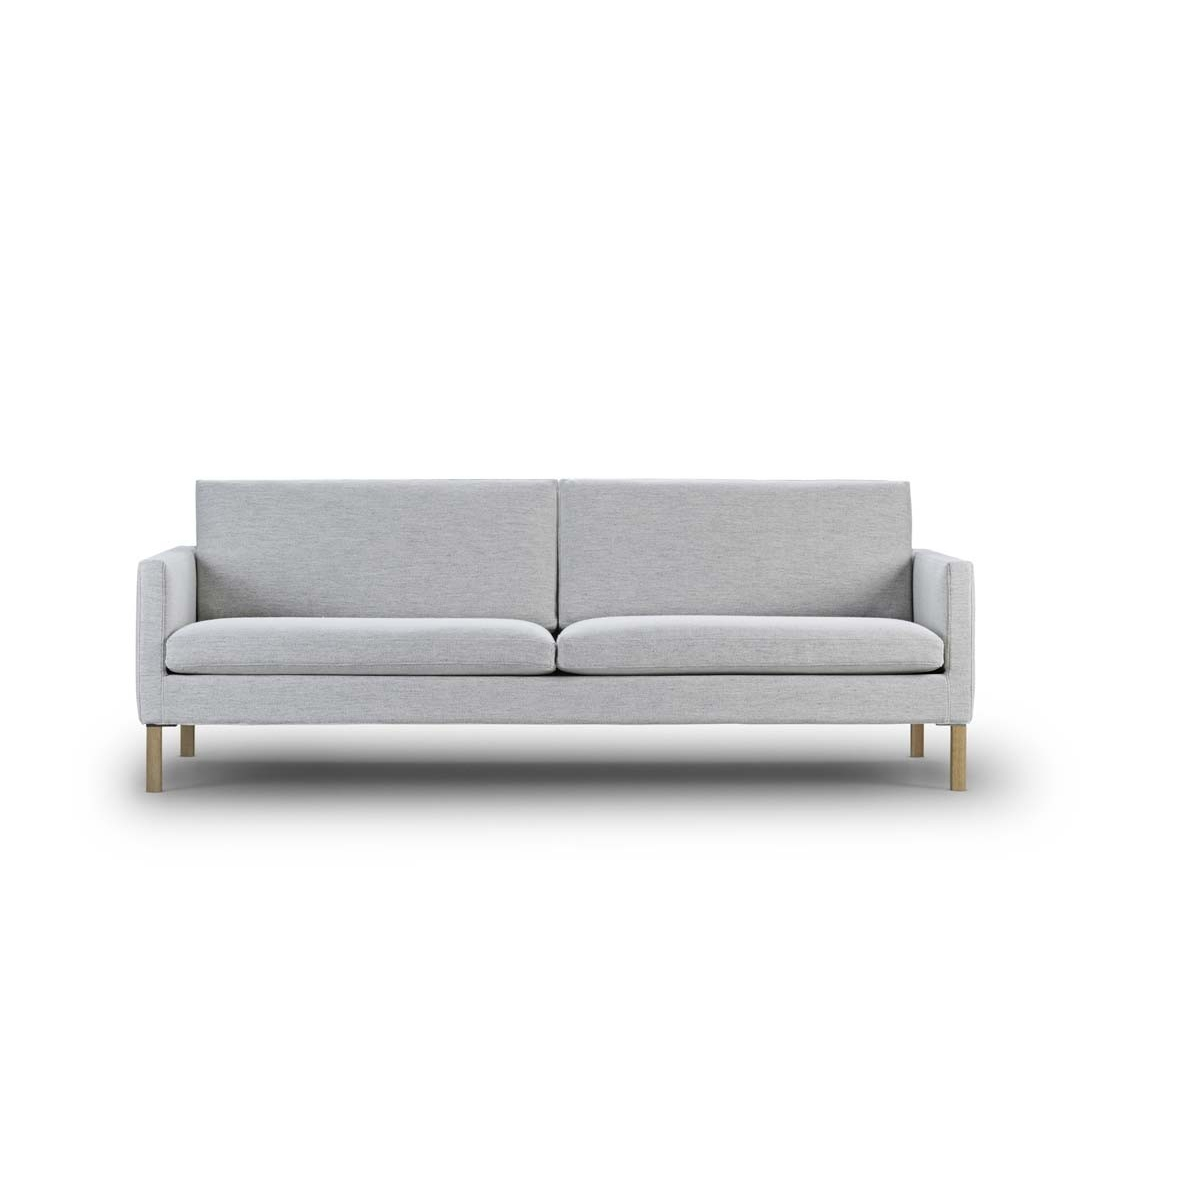 JUUL 904 modul sofa - Nine zero four | Bolighuset Werenberg